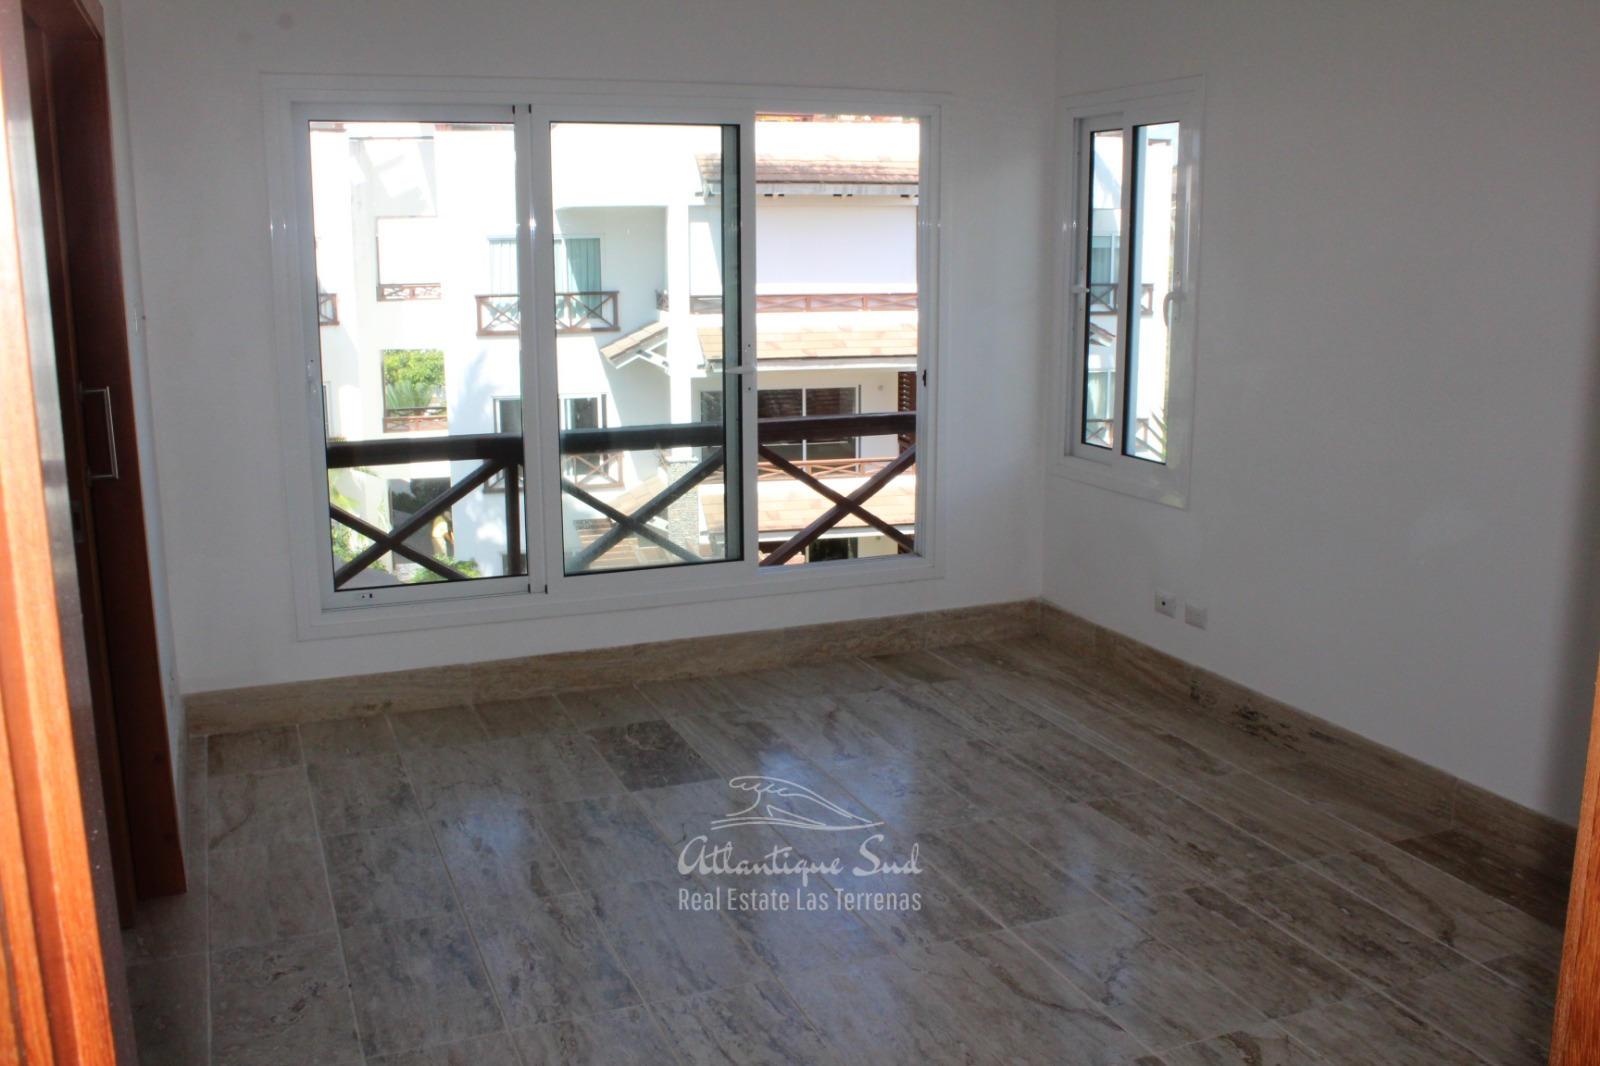 Apartments near the beach real estate las terrenas dominican republic 31 (8).jpg